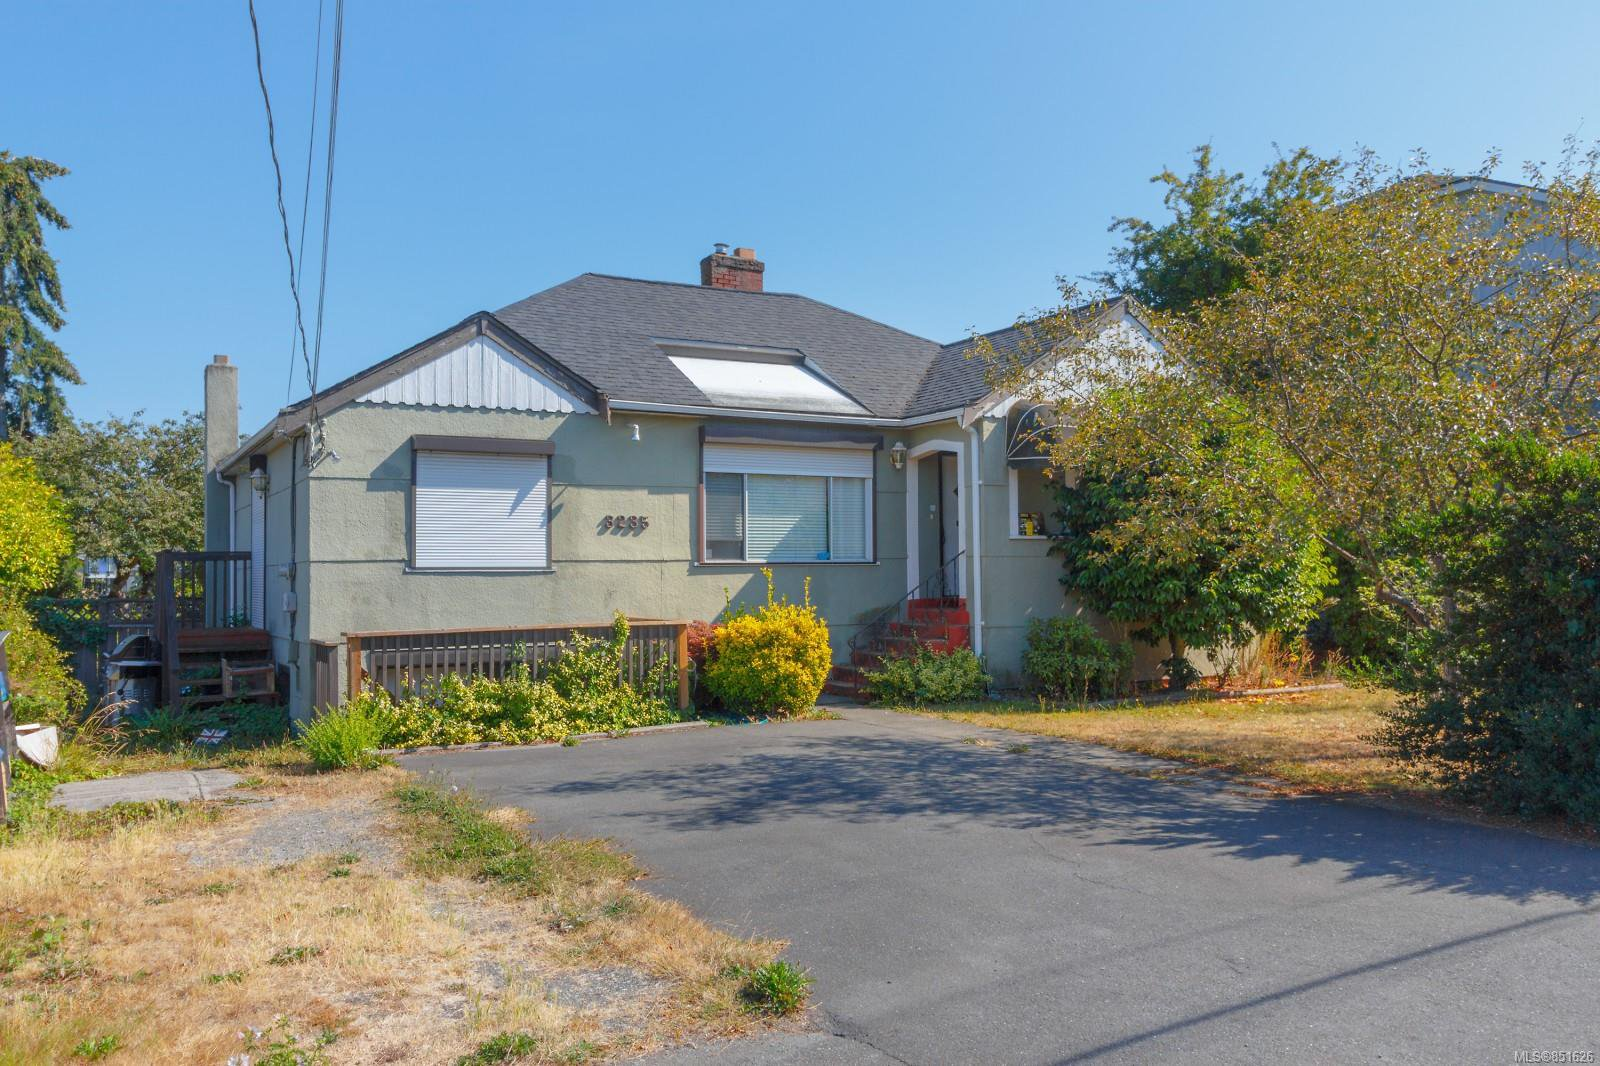 Main Photo: 3235 Harriet Rd in : SW Rudd Park House for sale (Saanich West)  : MLS®# 851626